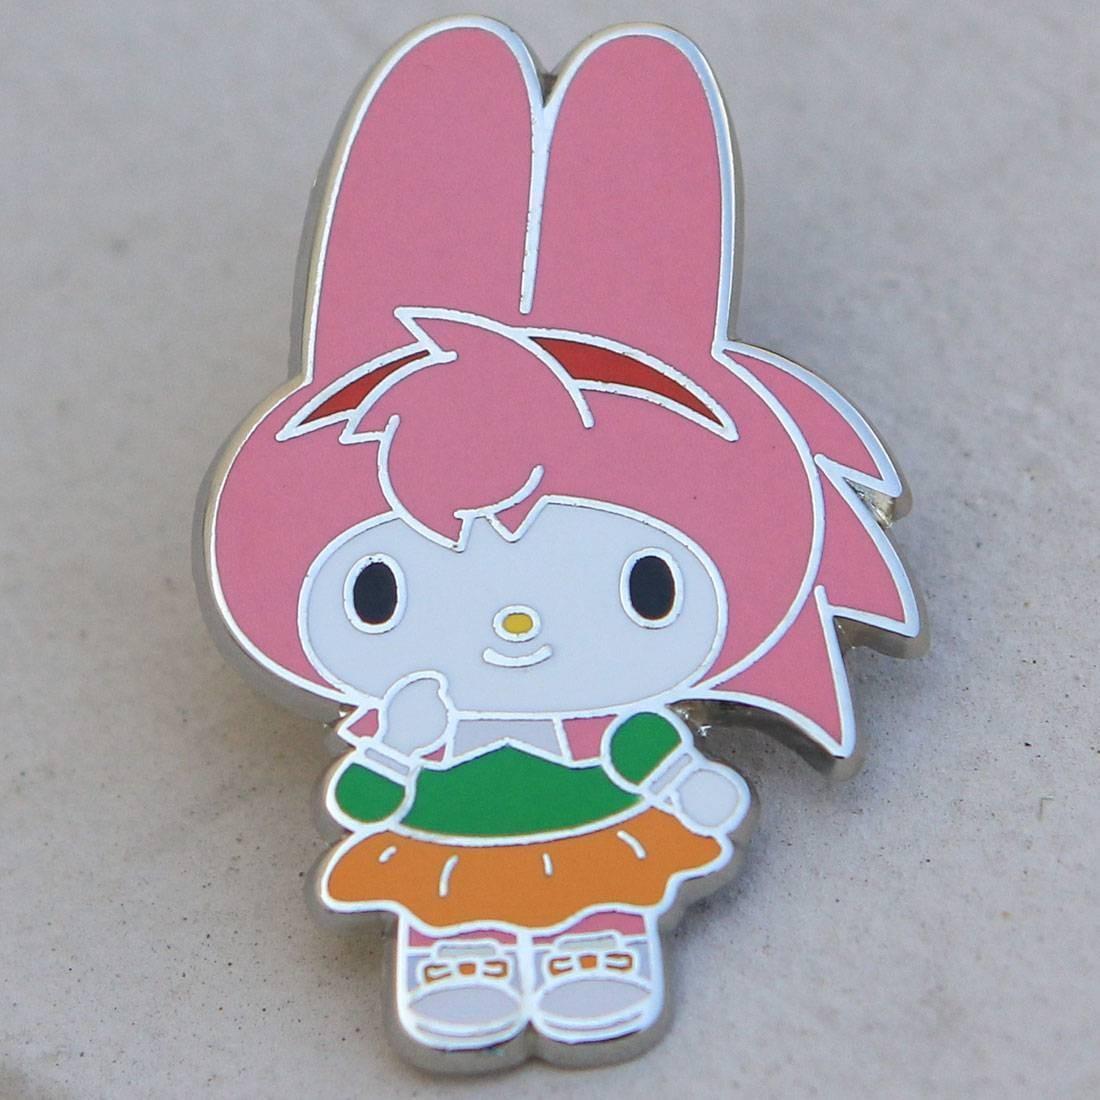 BAIT x Sanrio x Sonic Pink My Melody Pin (pink)